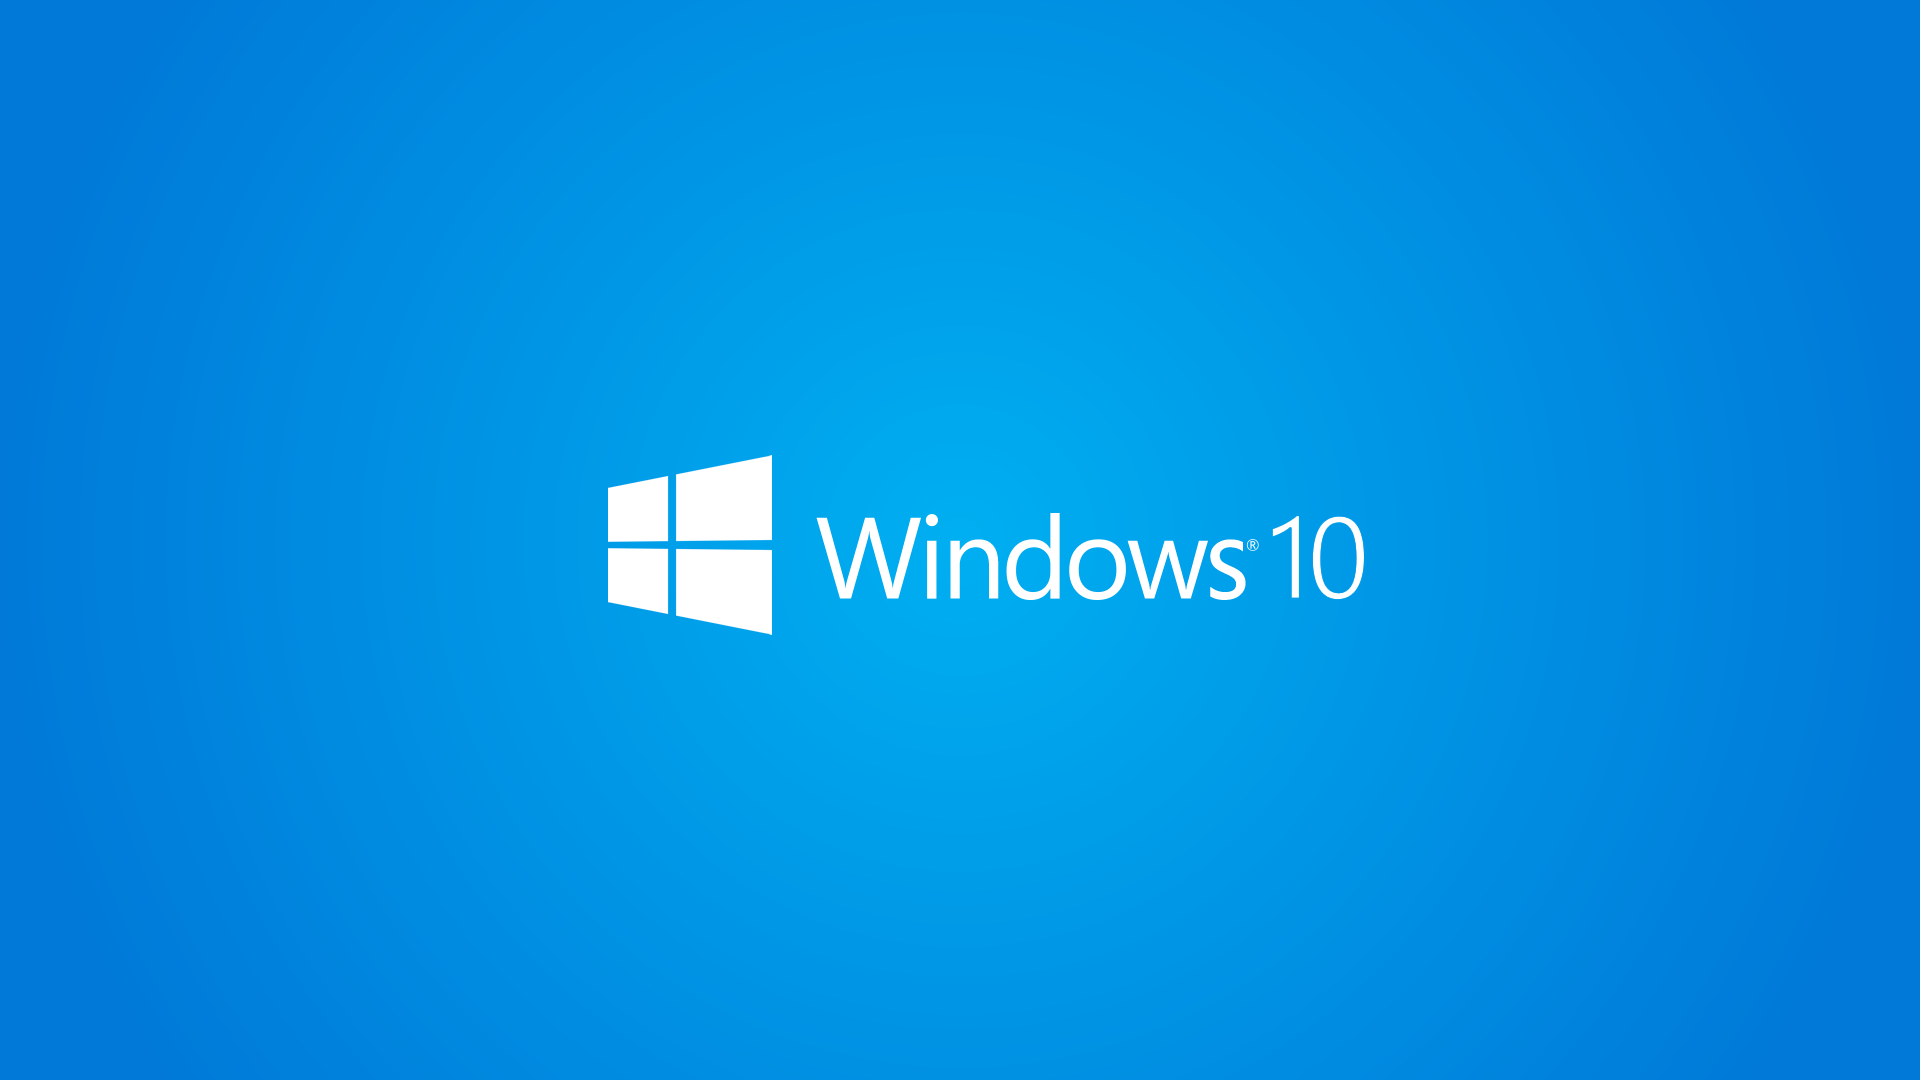 Hd wallpaper samsung - Windows 10 Wallpaper 1080p Full Hd White Logo Blue